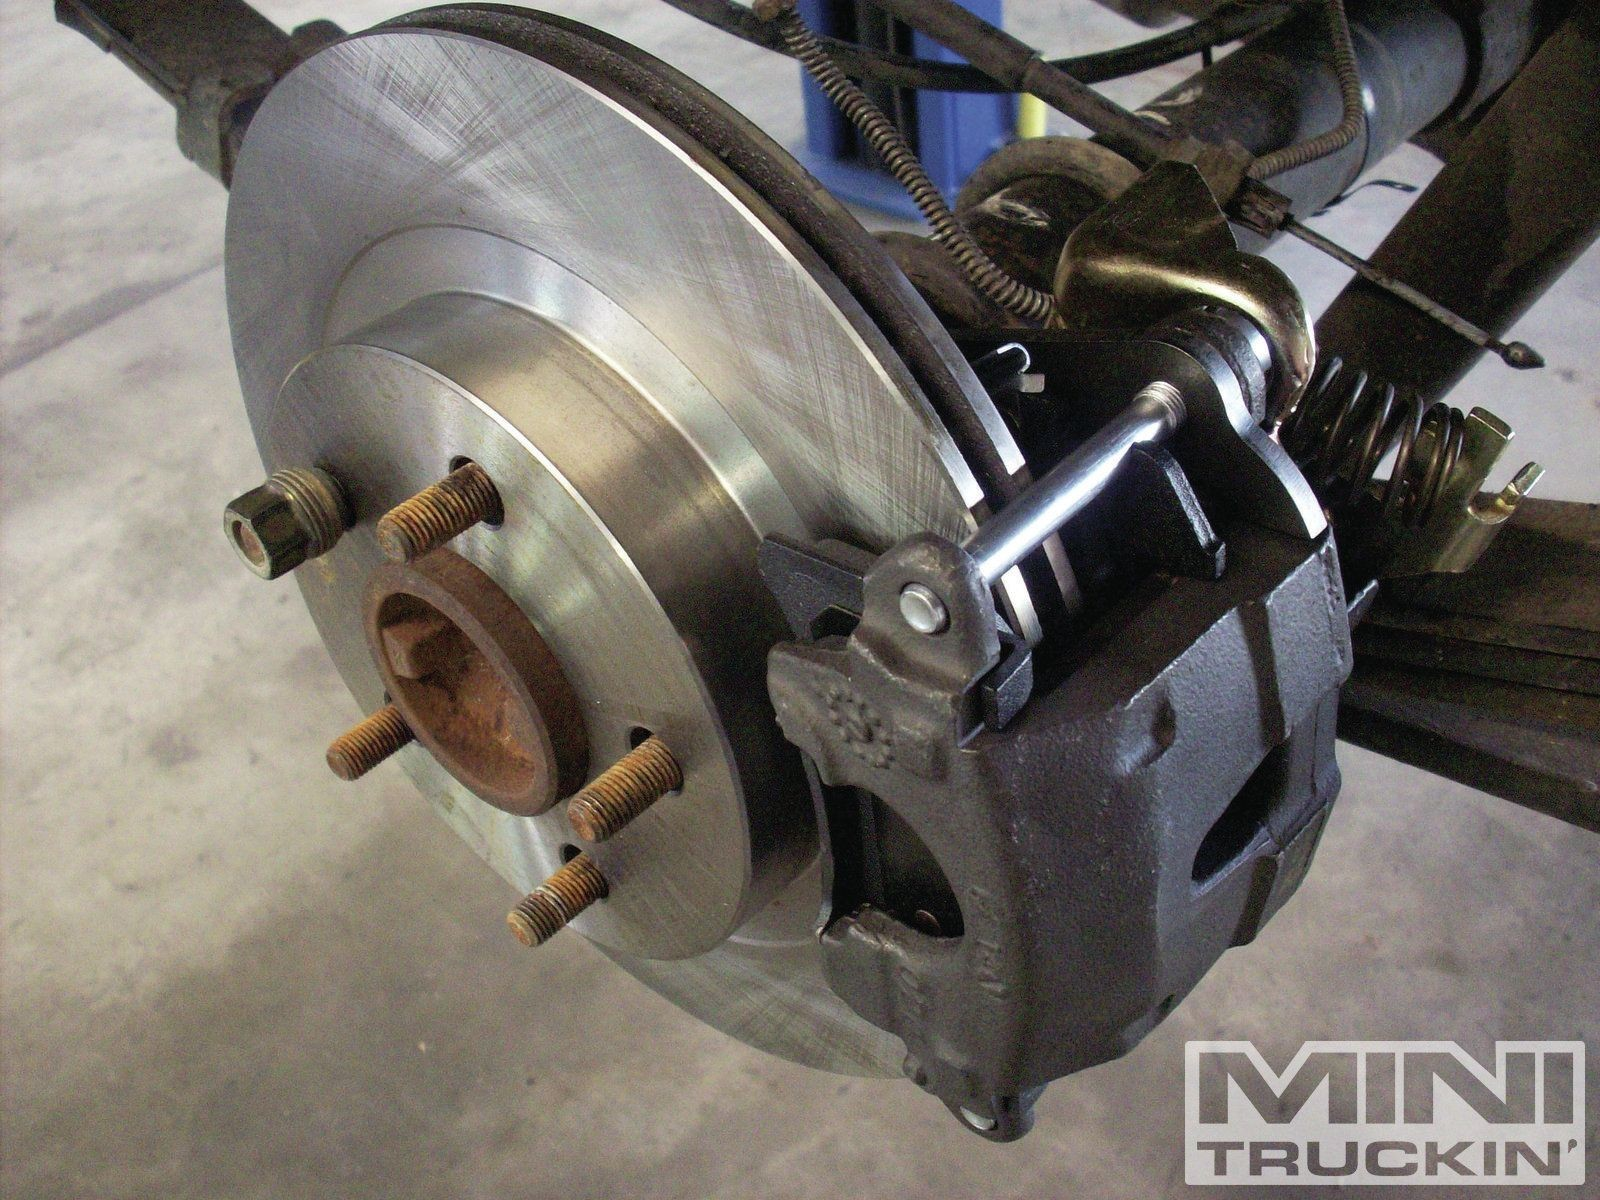 Front Drum Brake Diagram Chevy S10 Rear Disc Brake Conversion bye bye to Dumb Drums Mini Of Front Drum Brake Diagram